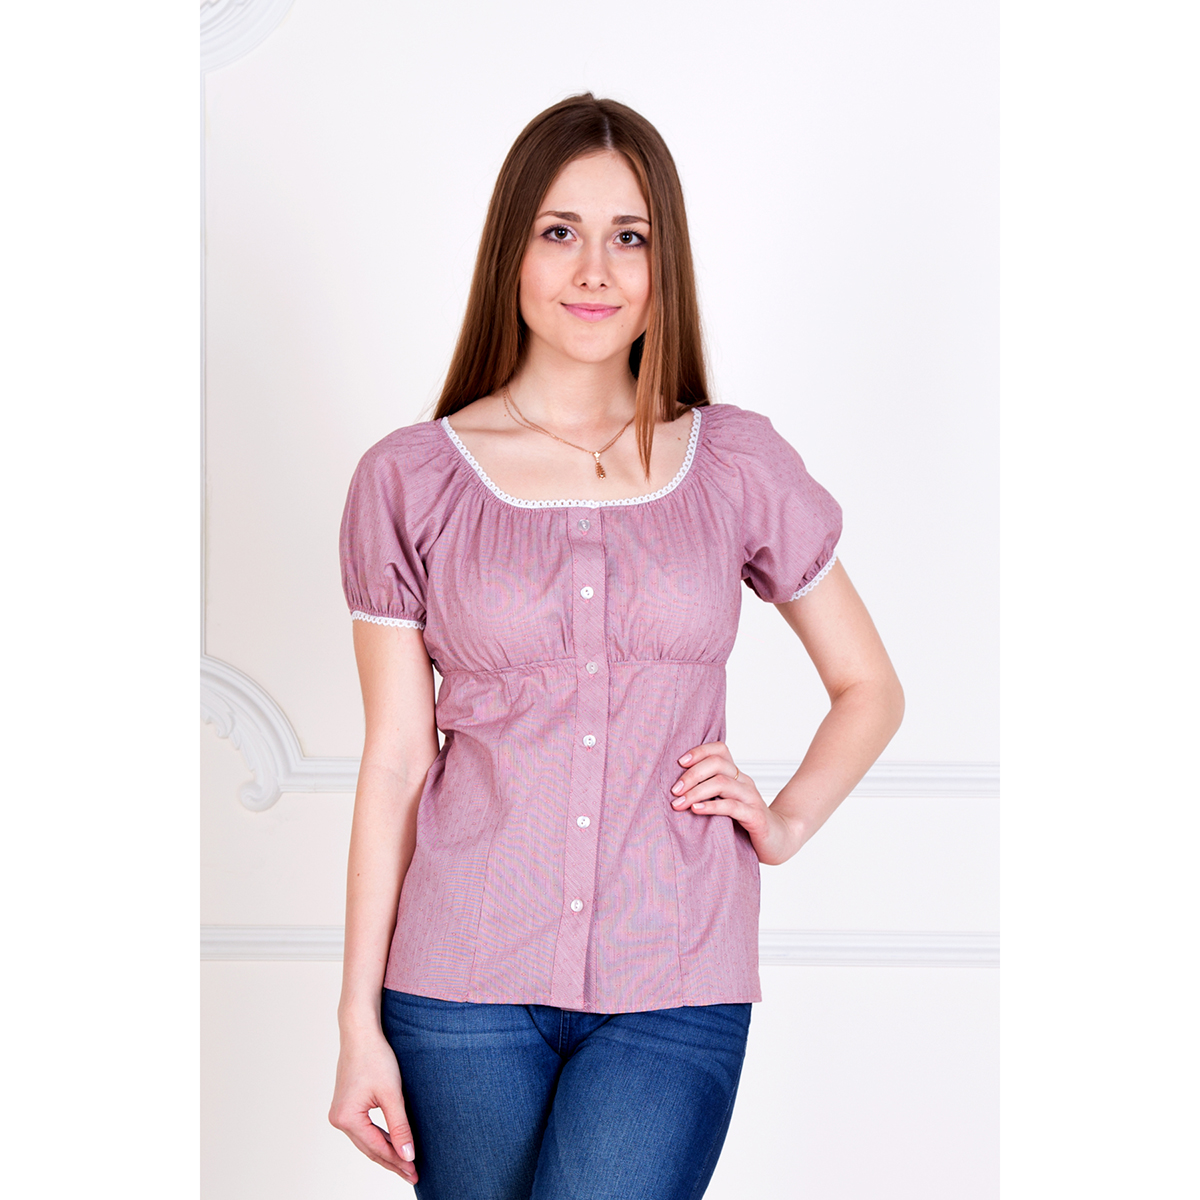 Женская рубашка Лада, размер 52Рубашки<br>Обхват груди:104 см<br>Обхват талии:85 см<br>Обхват бедер:112 см<br>Рост:167 см<br><br>Тип: Жен. рубашка<br>Размер: 52<br>Материал: Хлопок